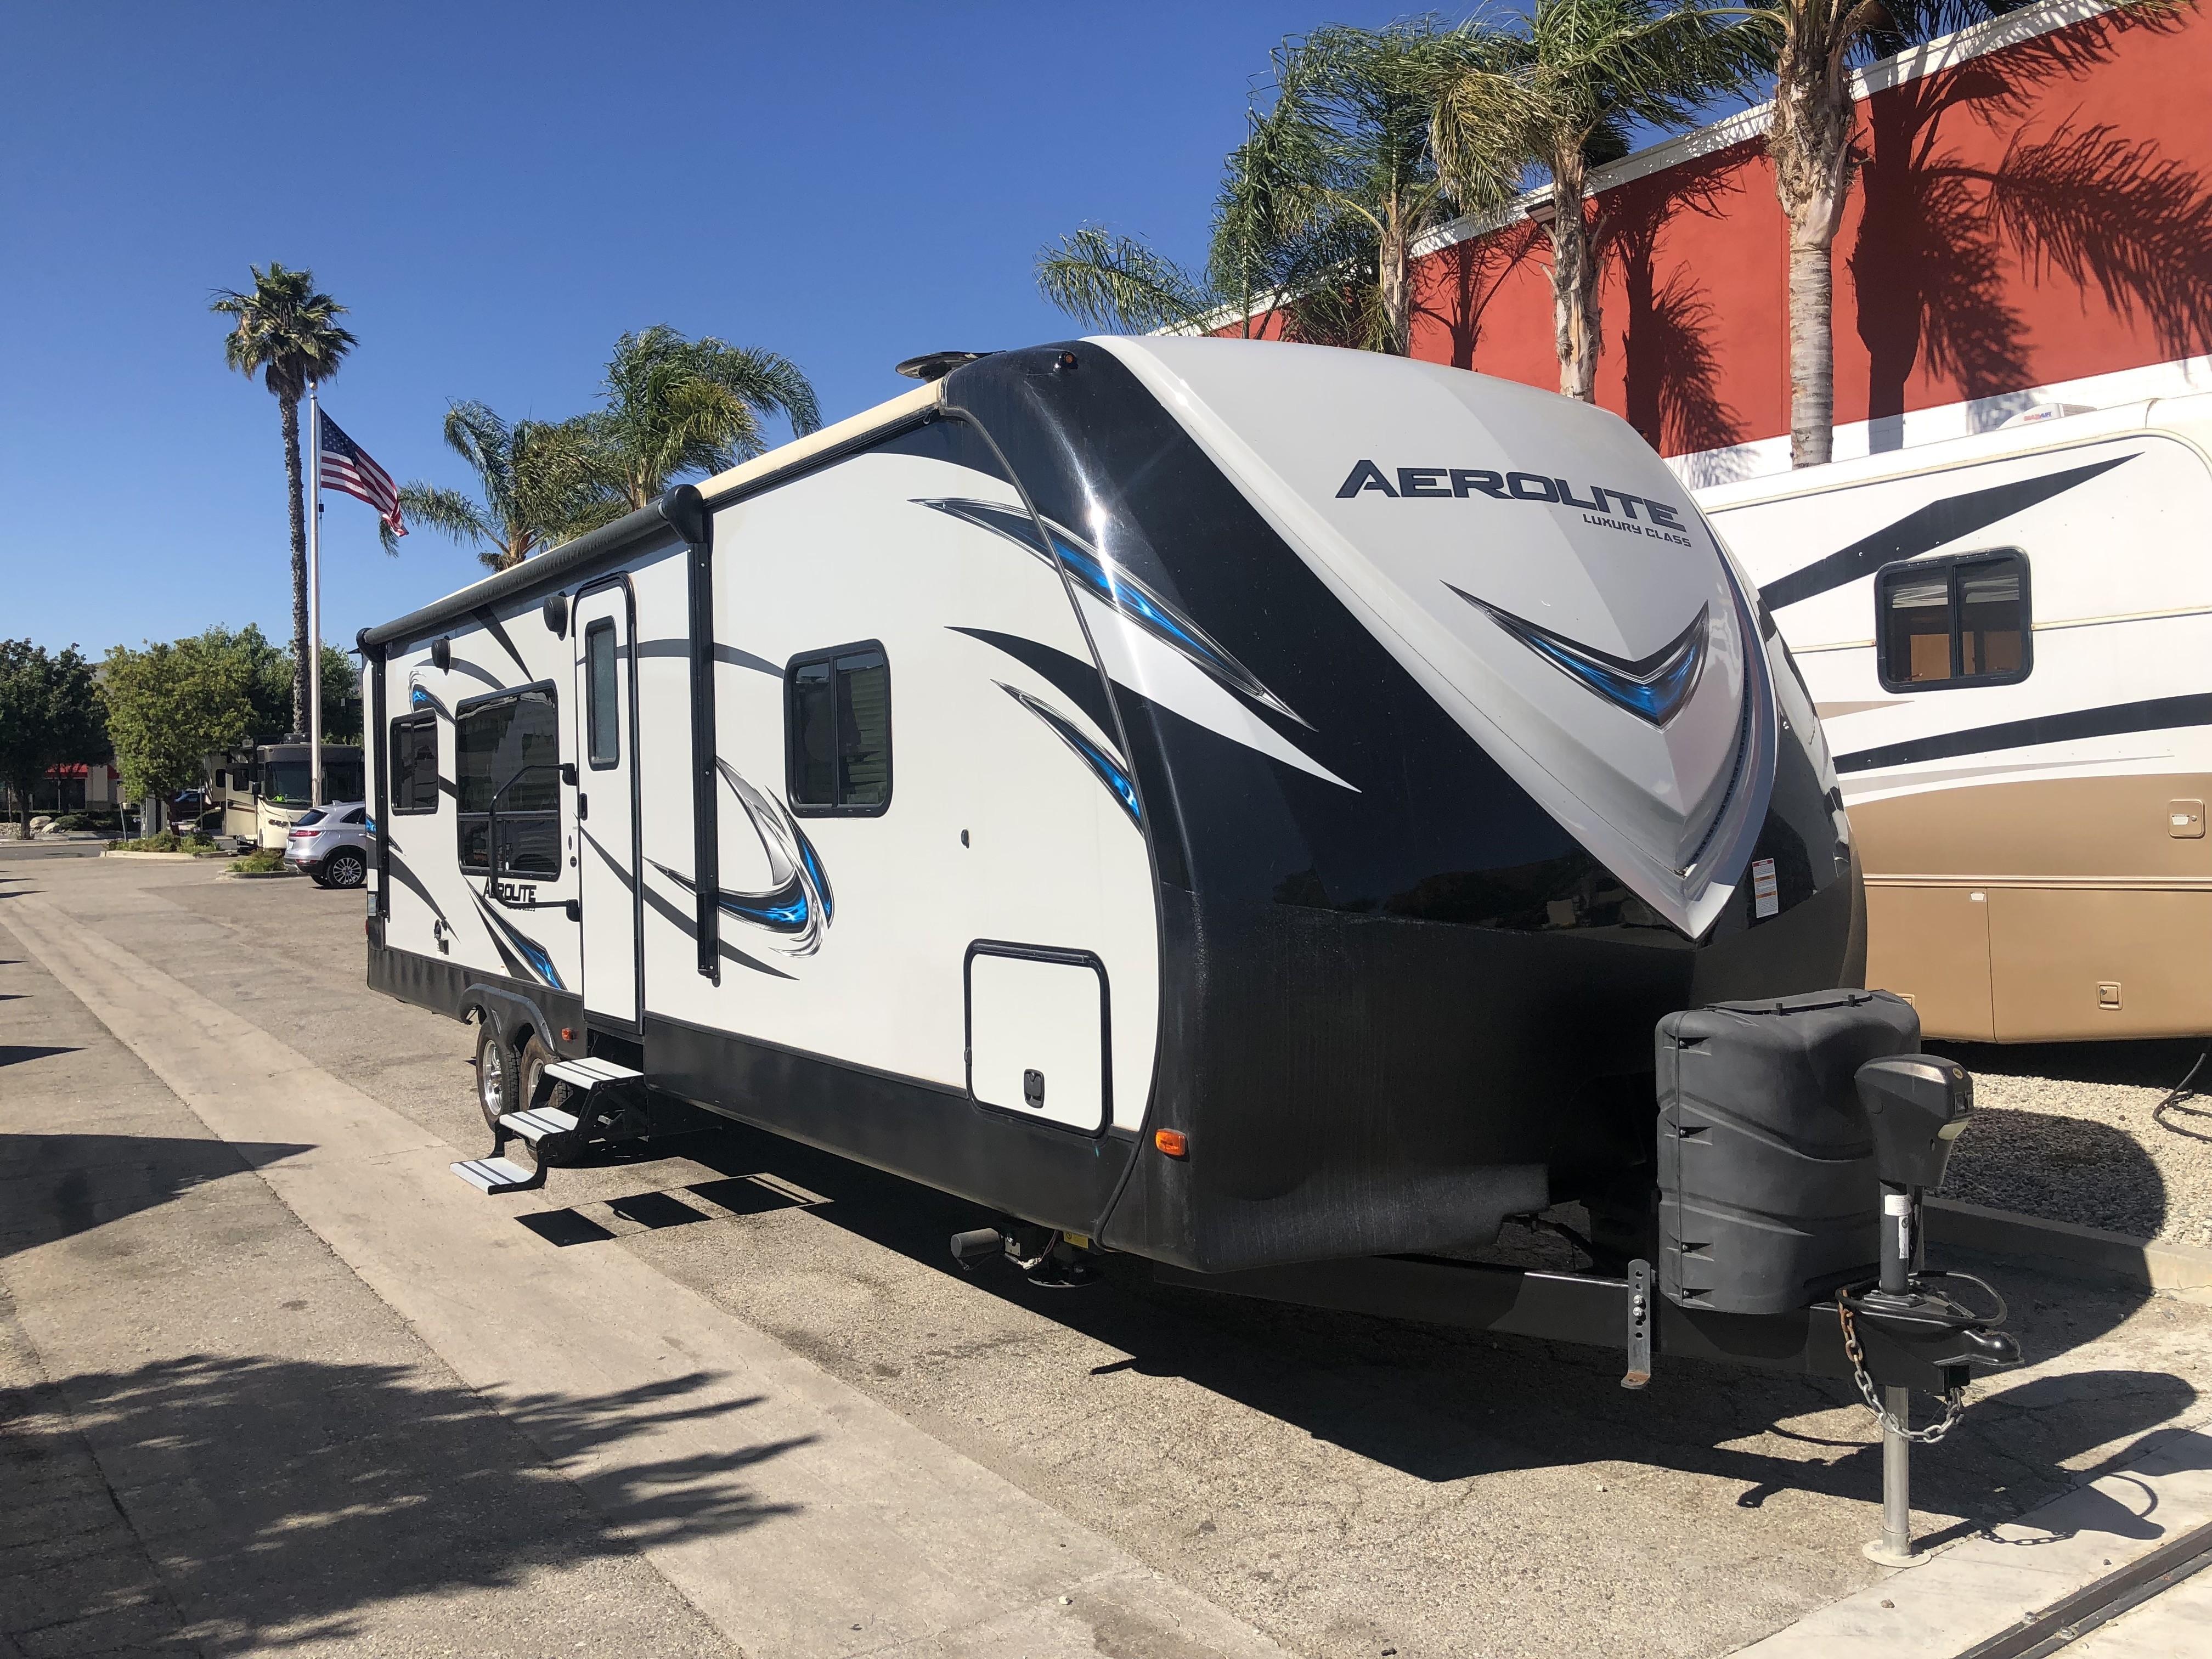 California RV Dealer | New & Used RV Sales, Parts, & Service